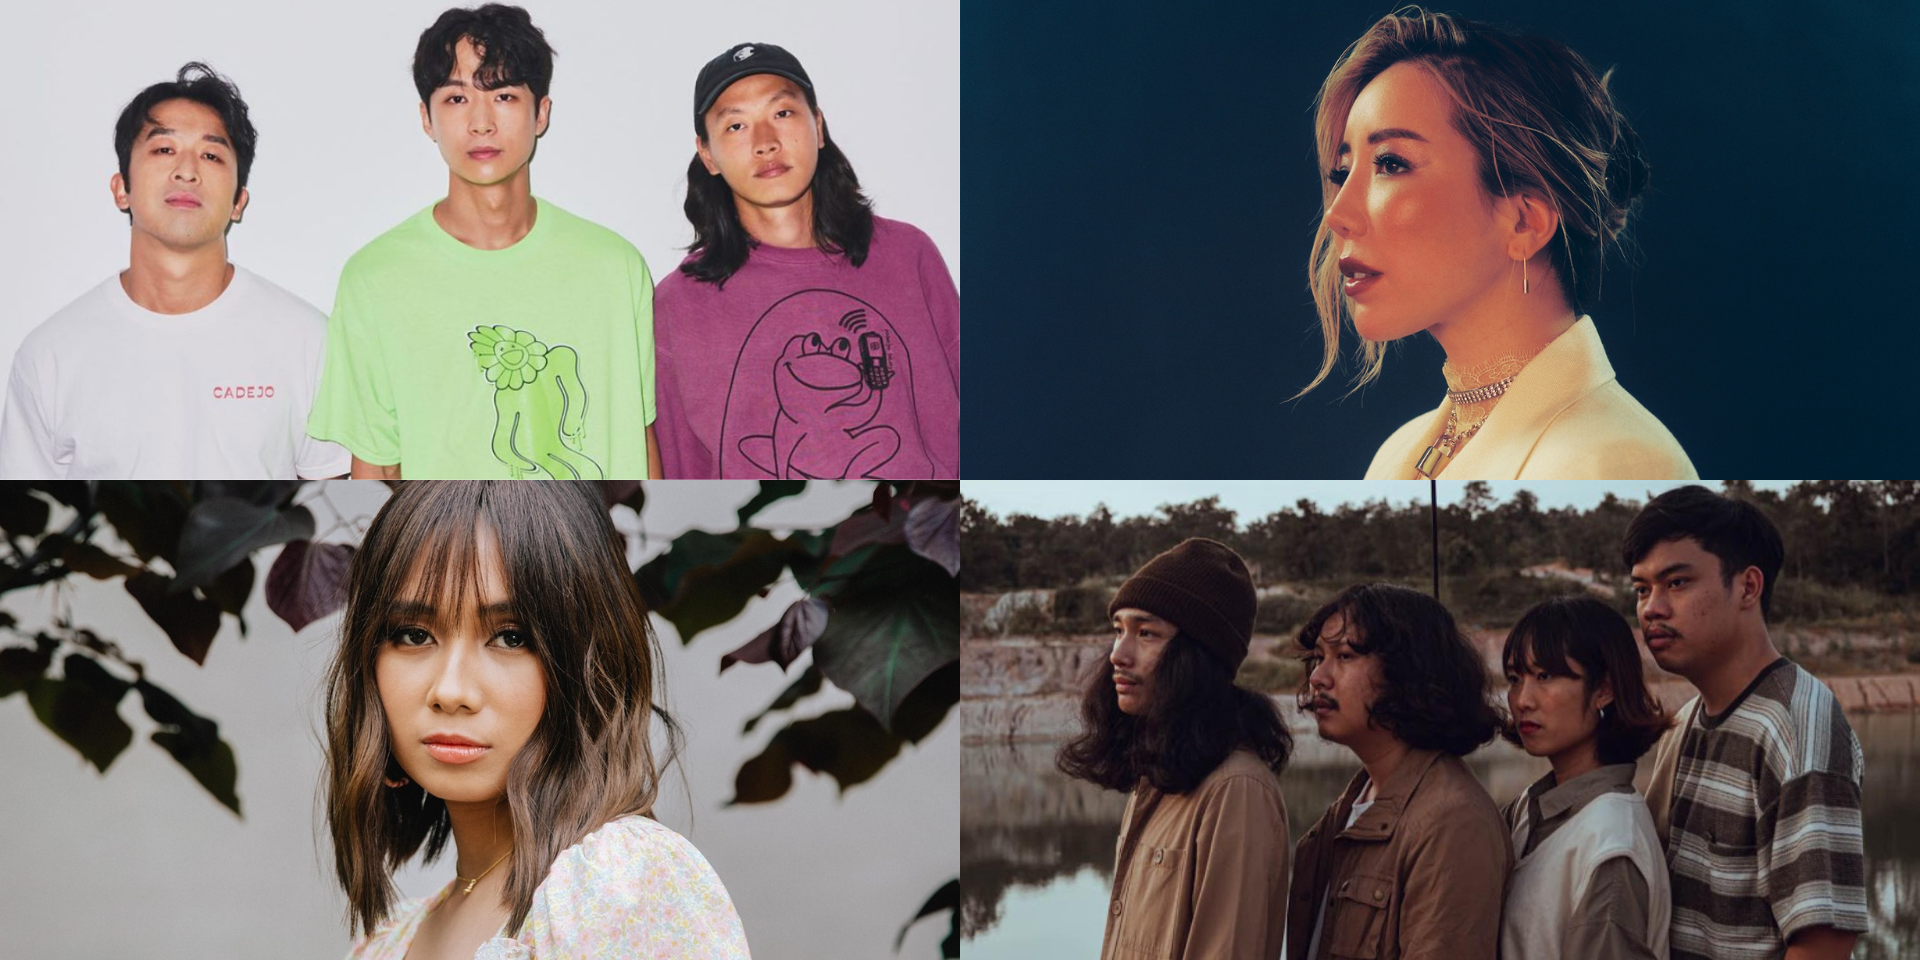 IKEA to hold online music festival this September featuring NIKI, TOKiMONSTA, YONLAPA, CADEJO, and more